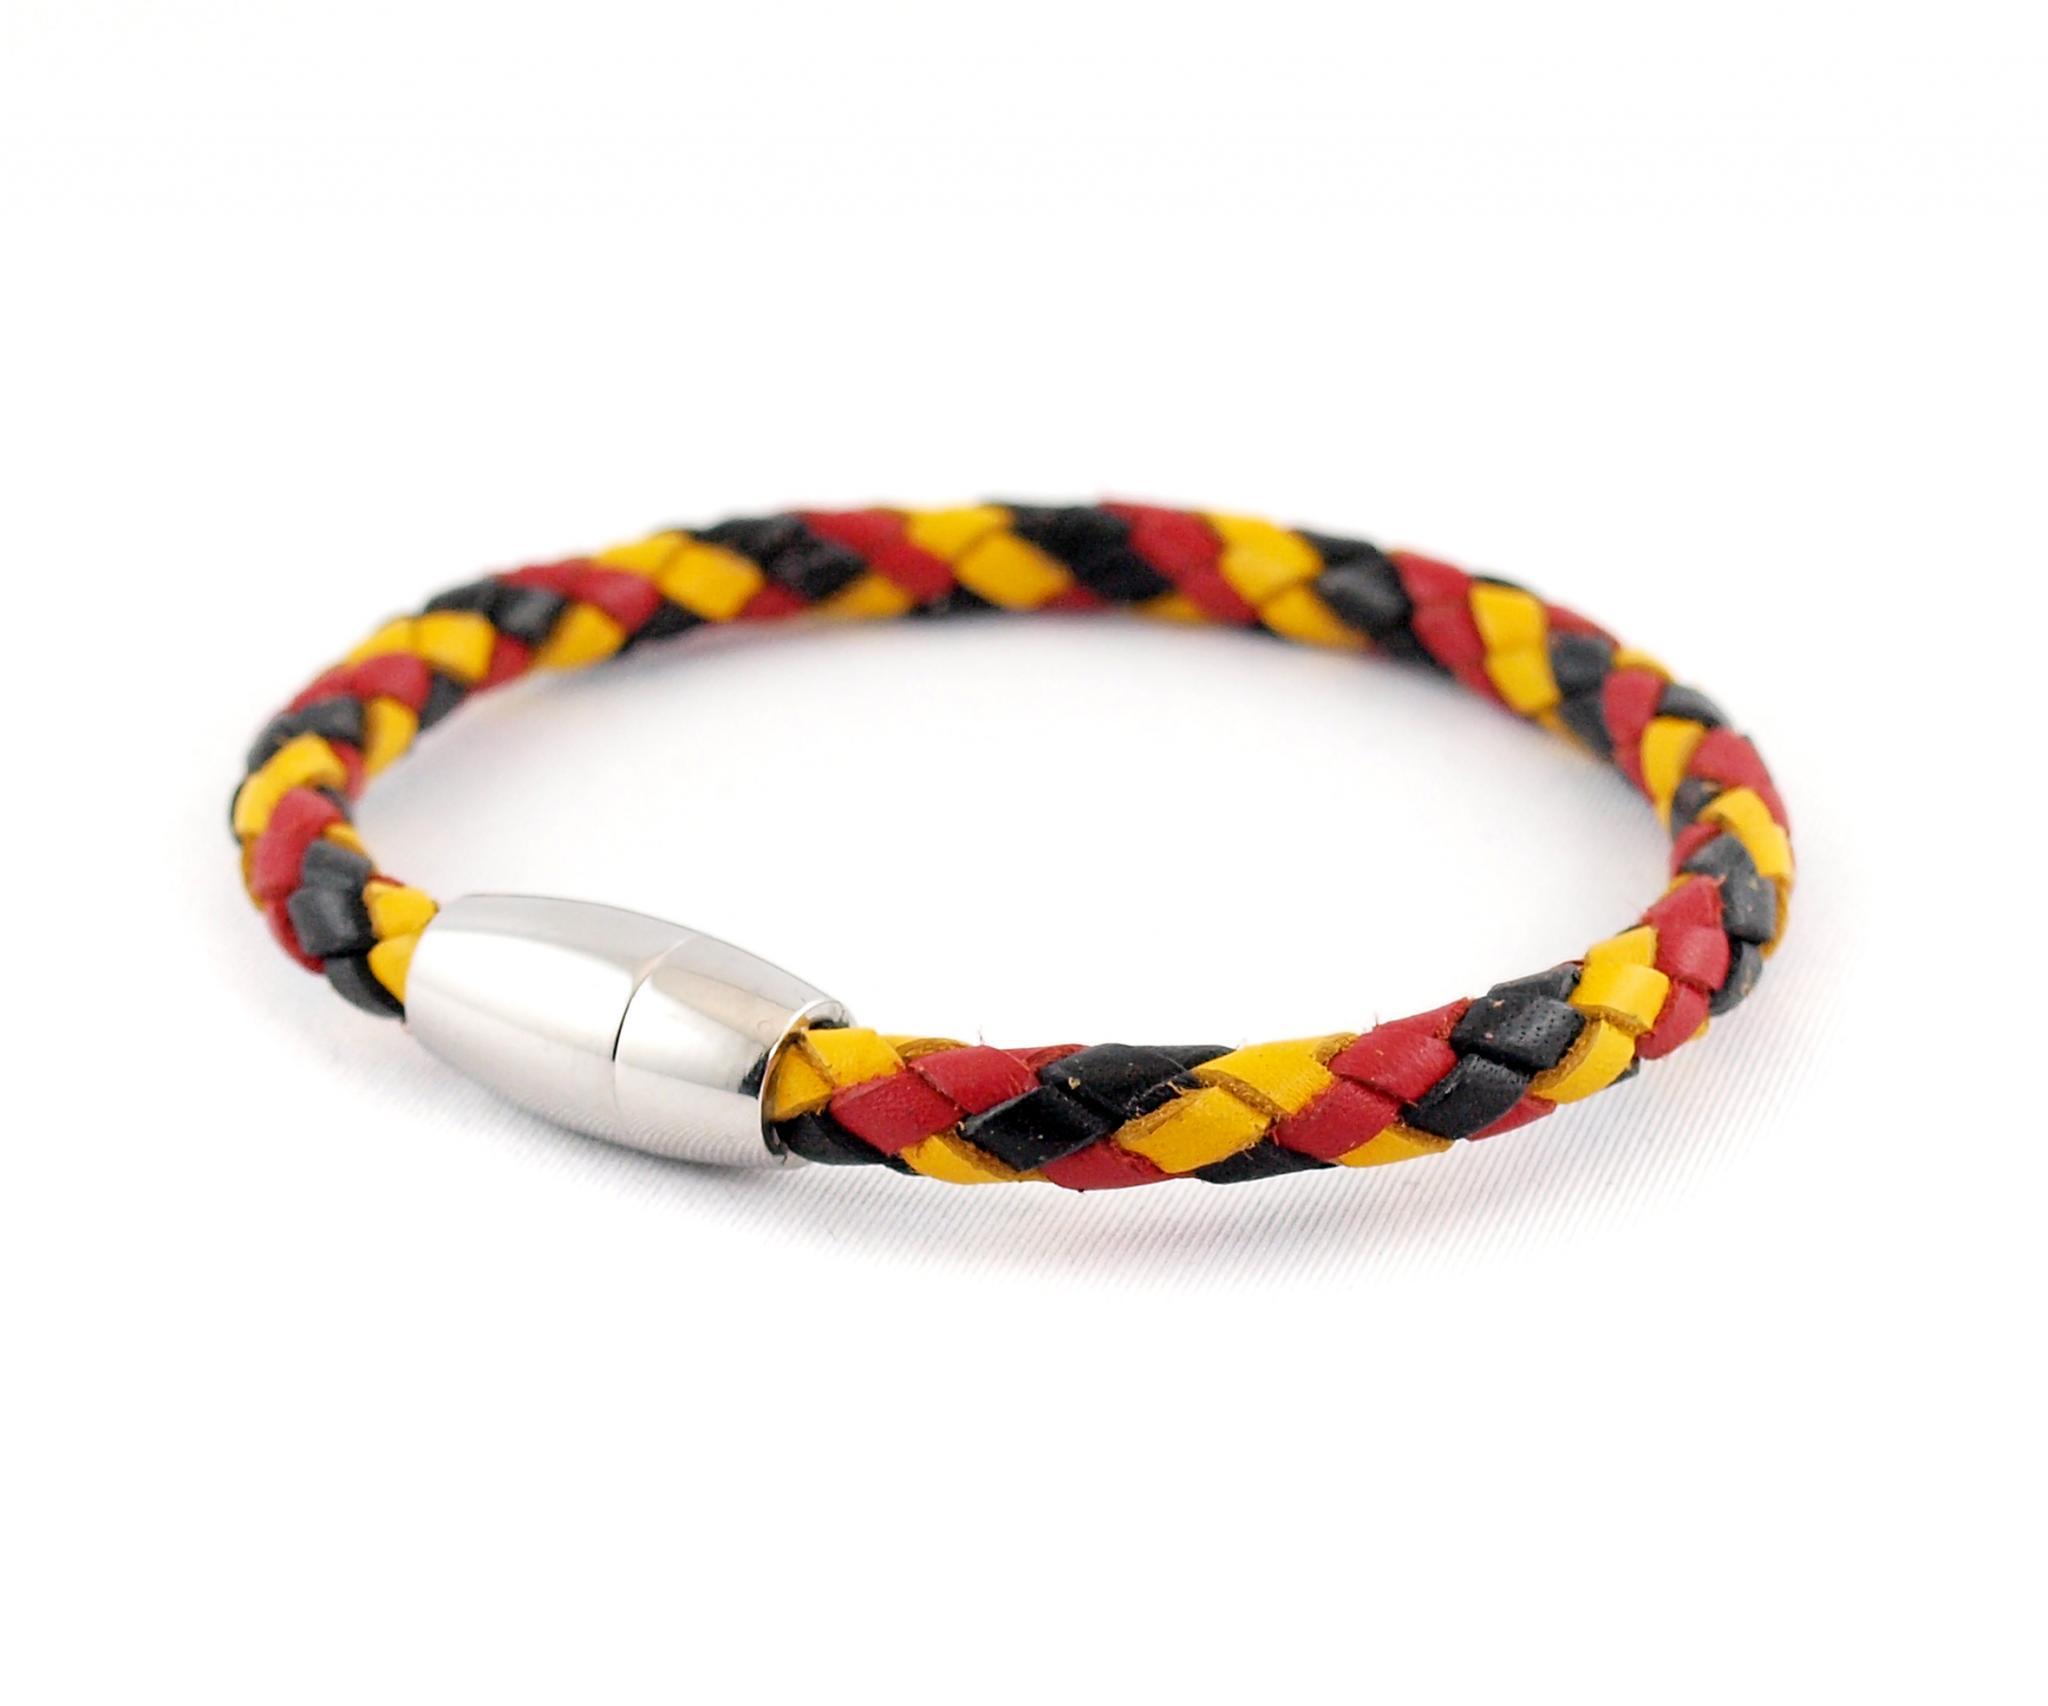 Luca-geflochtenesLederarmband-Edelstahlmagnet-schwarz-rot-gelb, wm, fanarmband